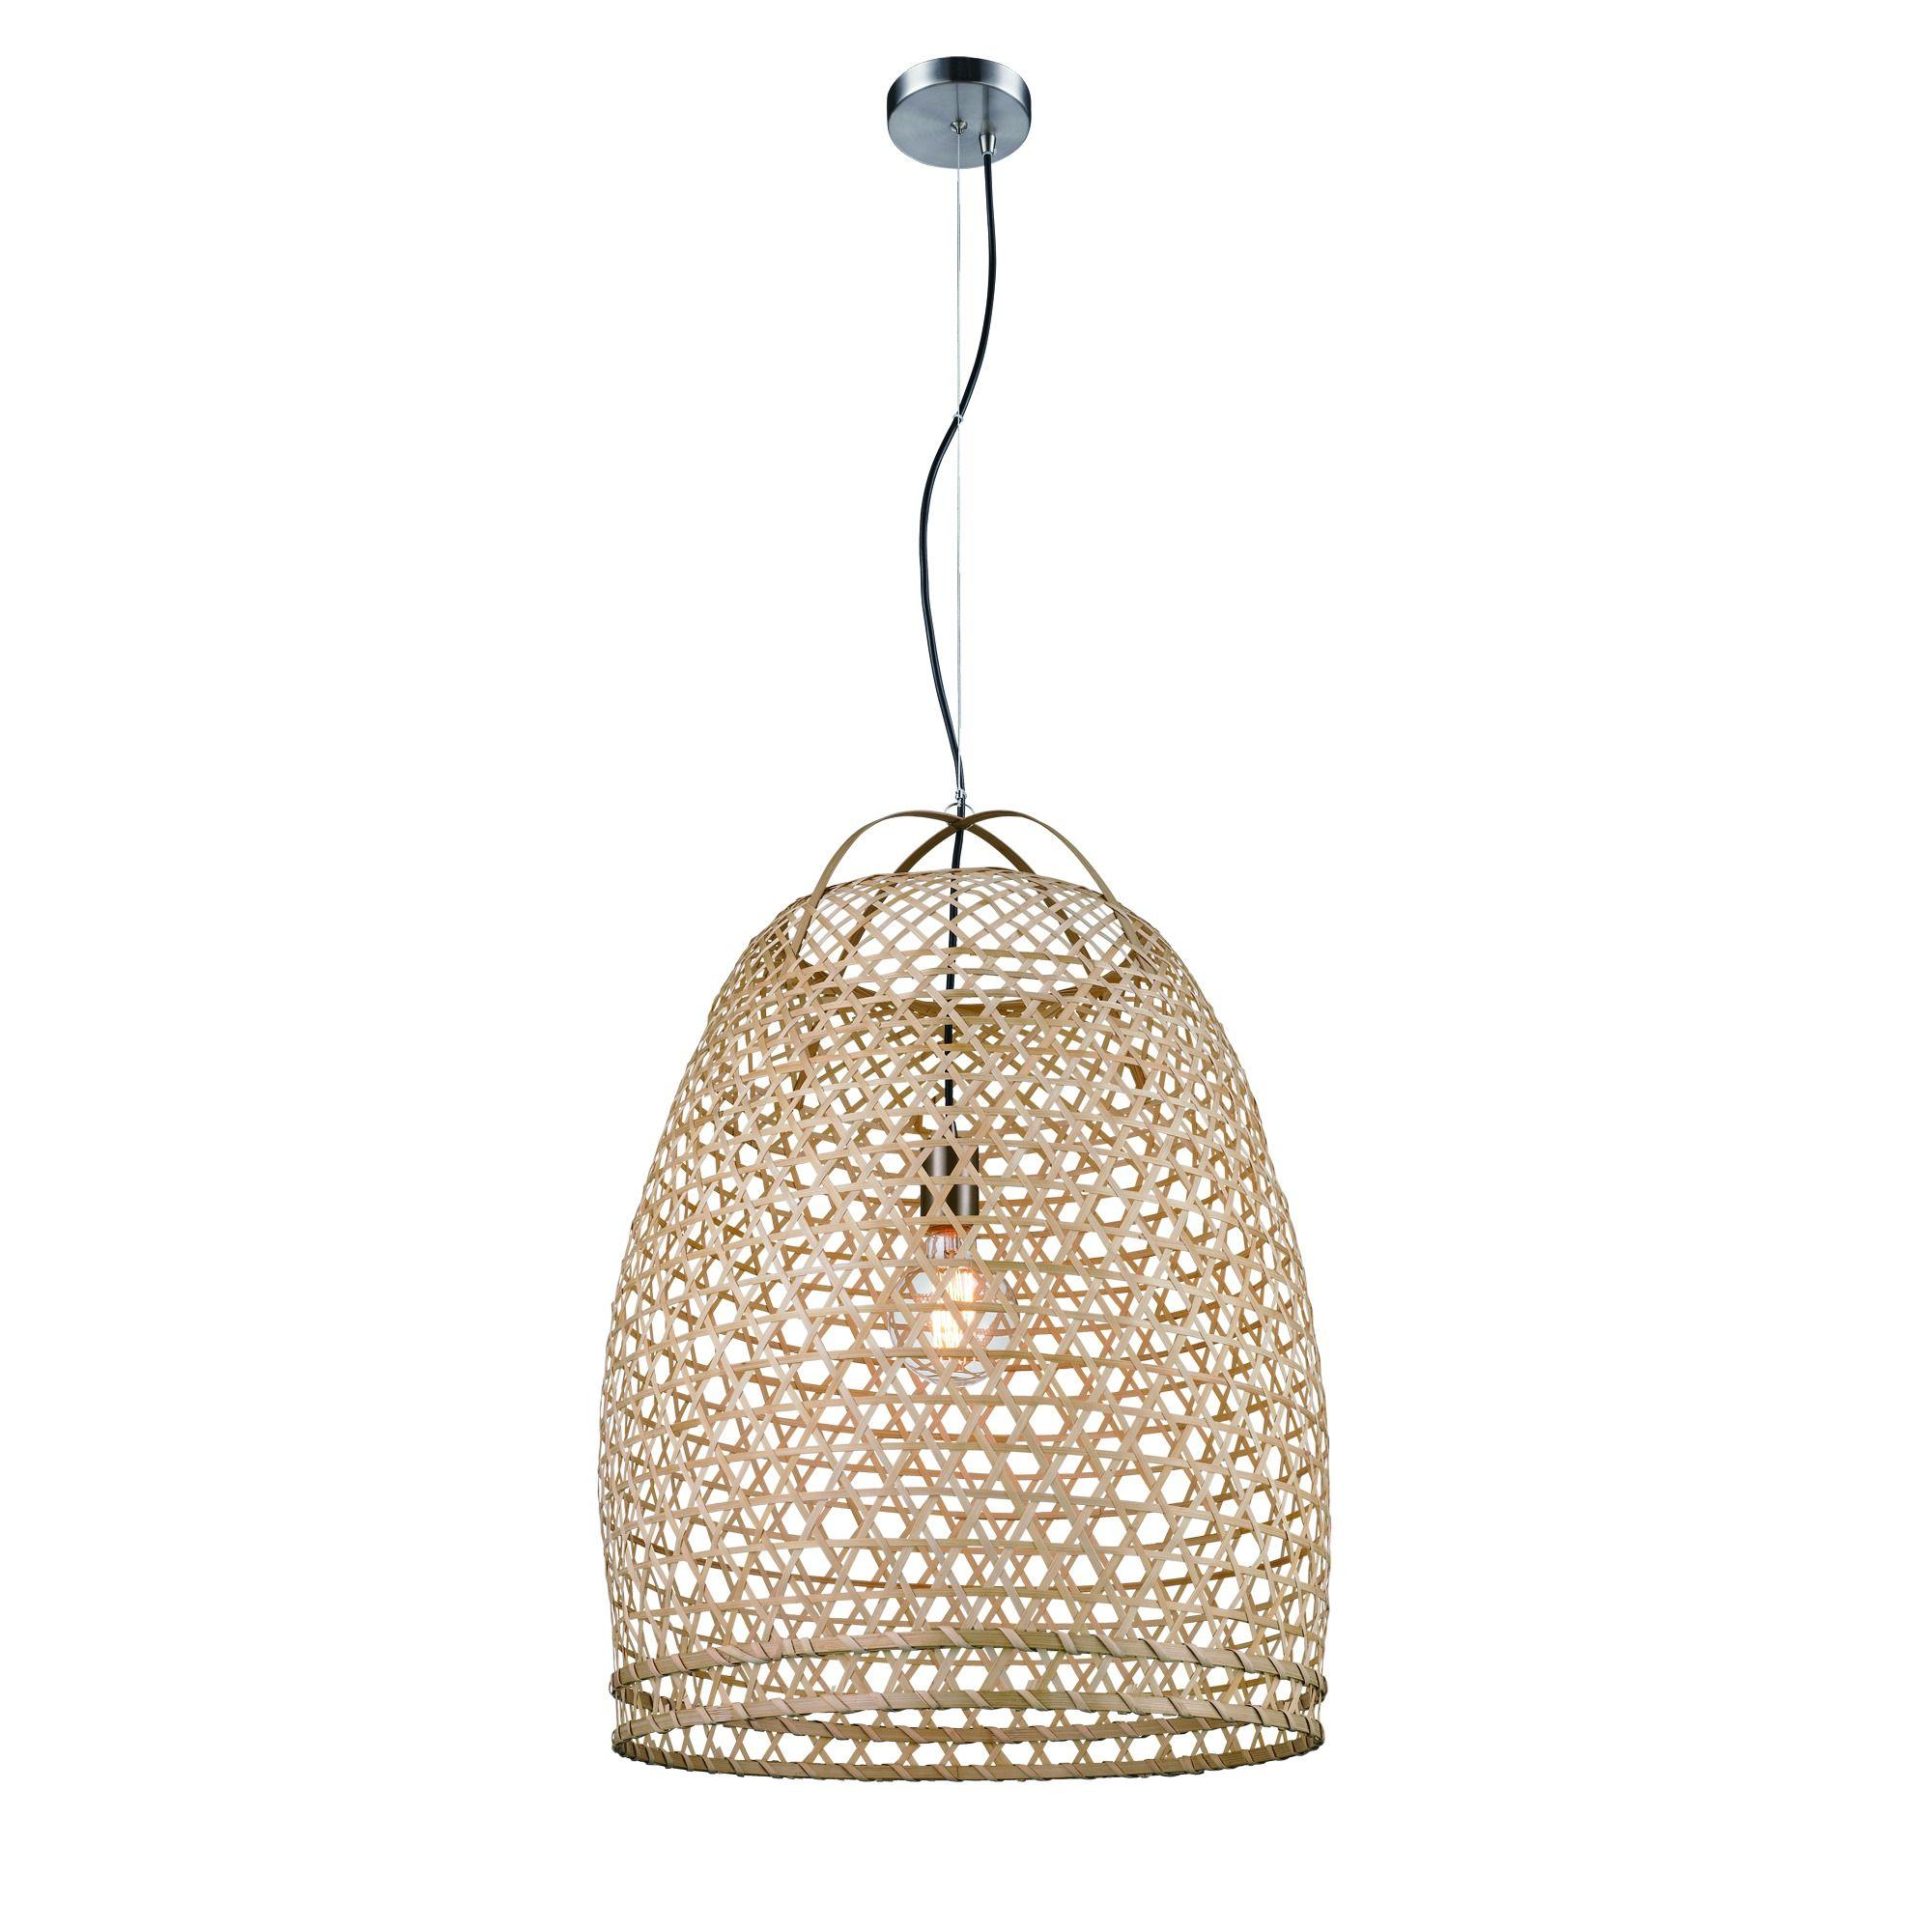 karwei hanglamp tara - kamer noa | pinterest - hanglamp, lampen en, Deco ideeën